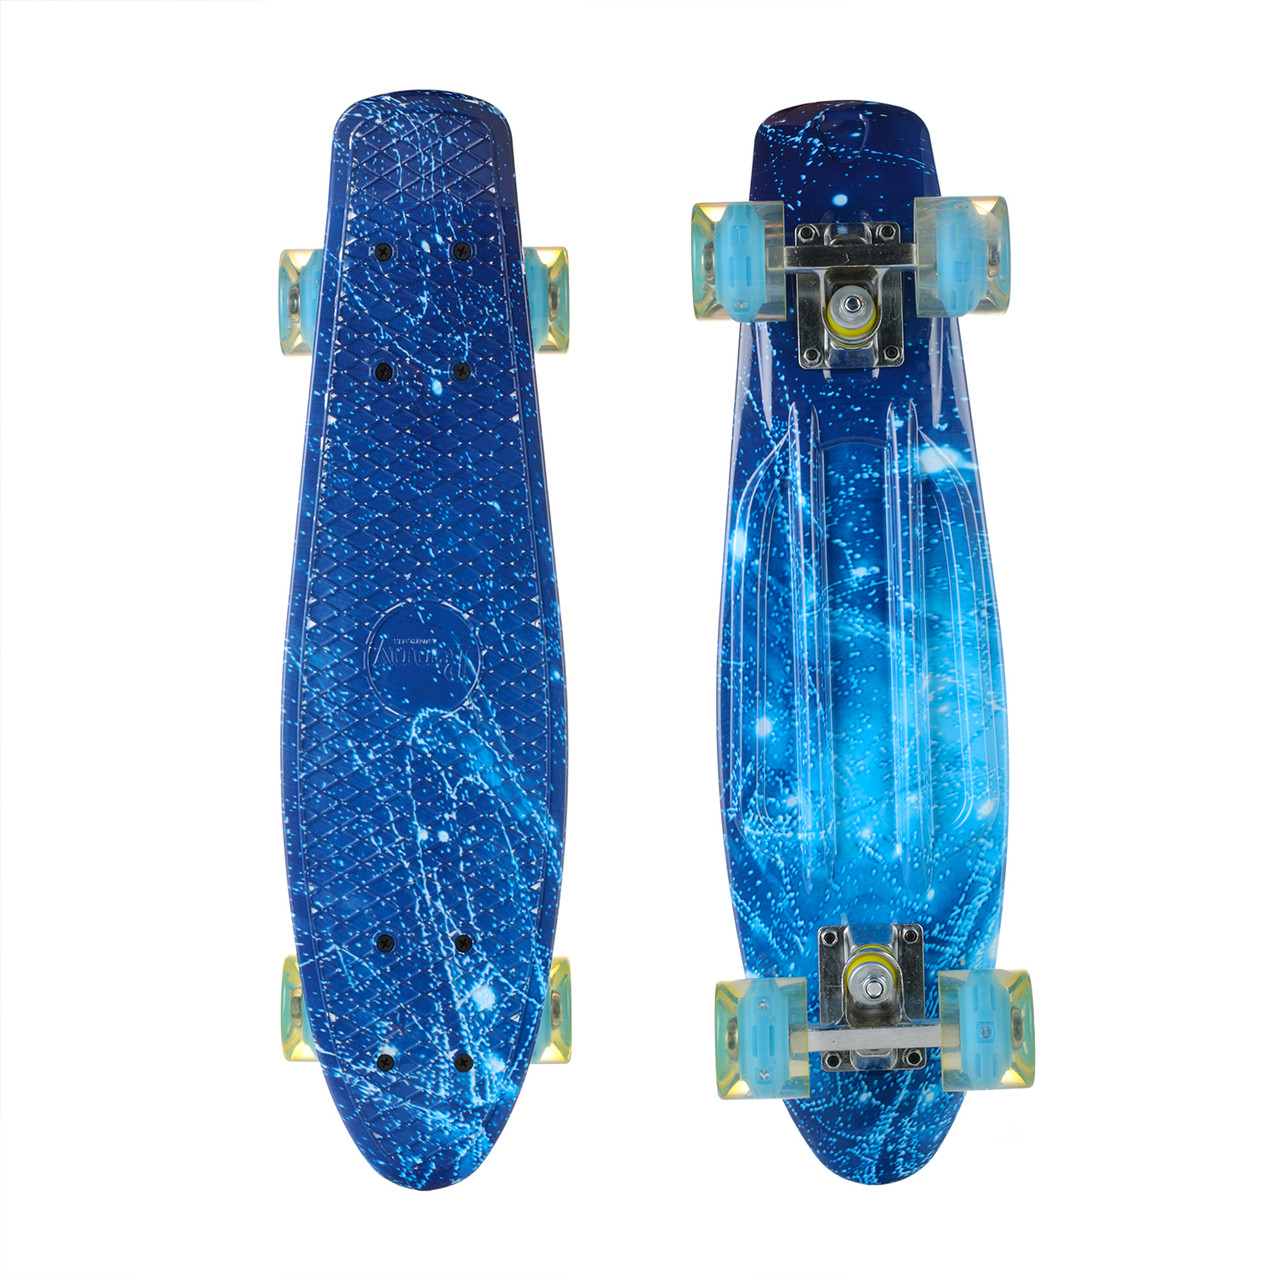 Пенни Борд Best Board 25, двухсторонний окрас, колёса PU светятся Голубой Лед